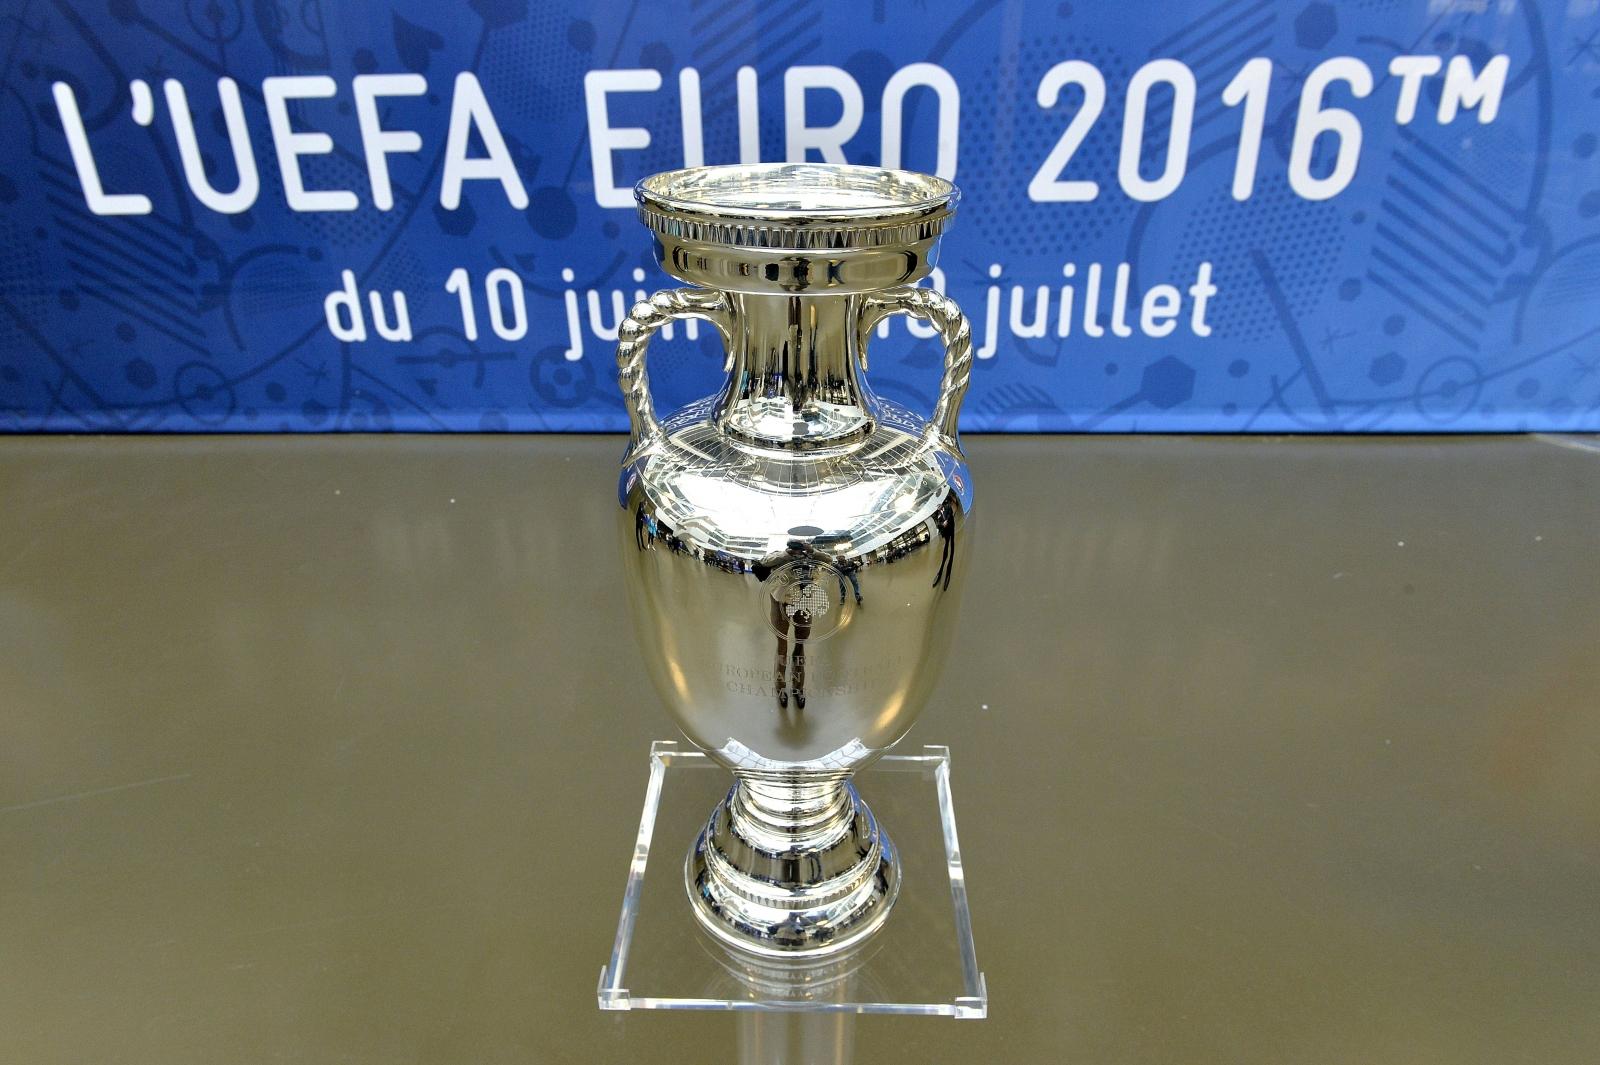 Euro 2016 trophy